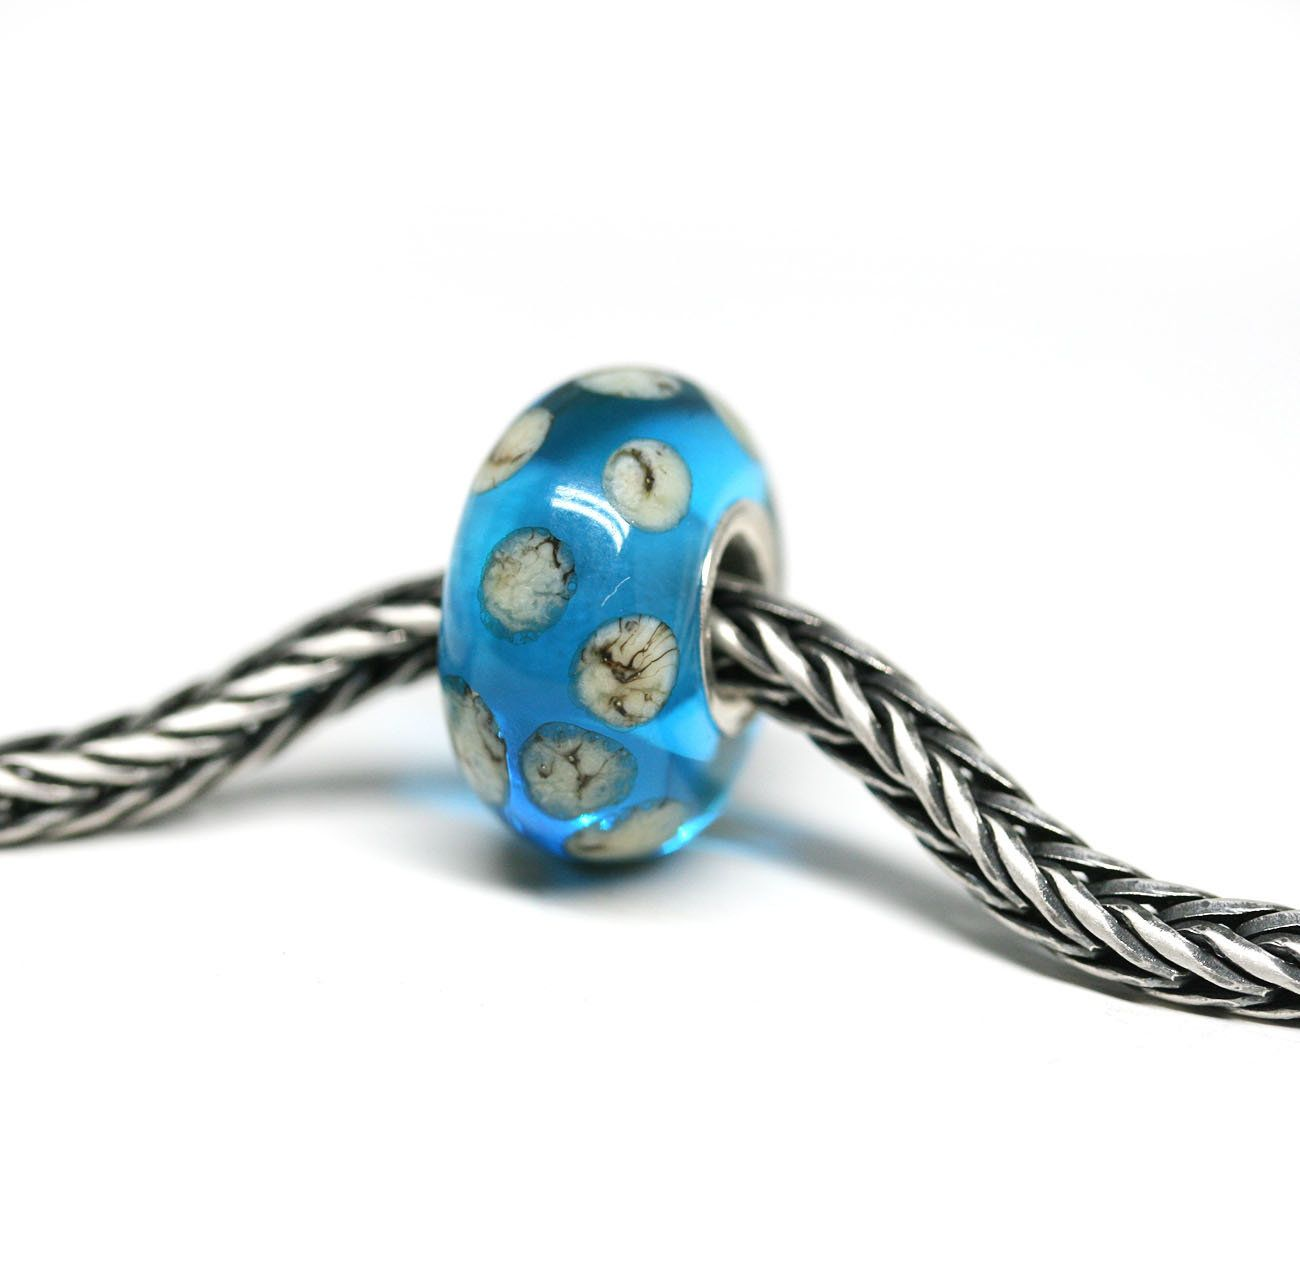 European style charm European bracelet Large hole bead Ocean jewelry Teal green and Black big hole bracelet bead